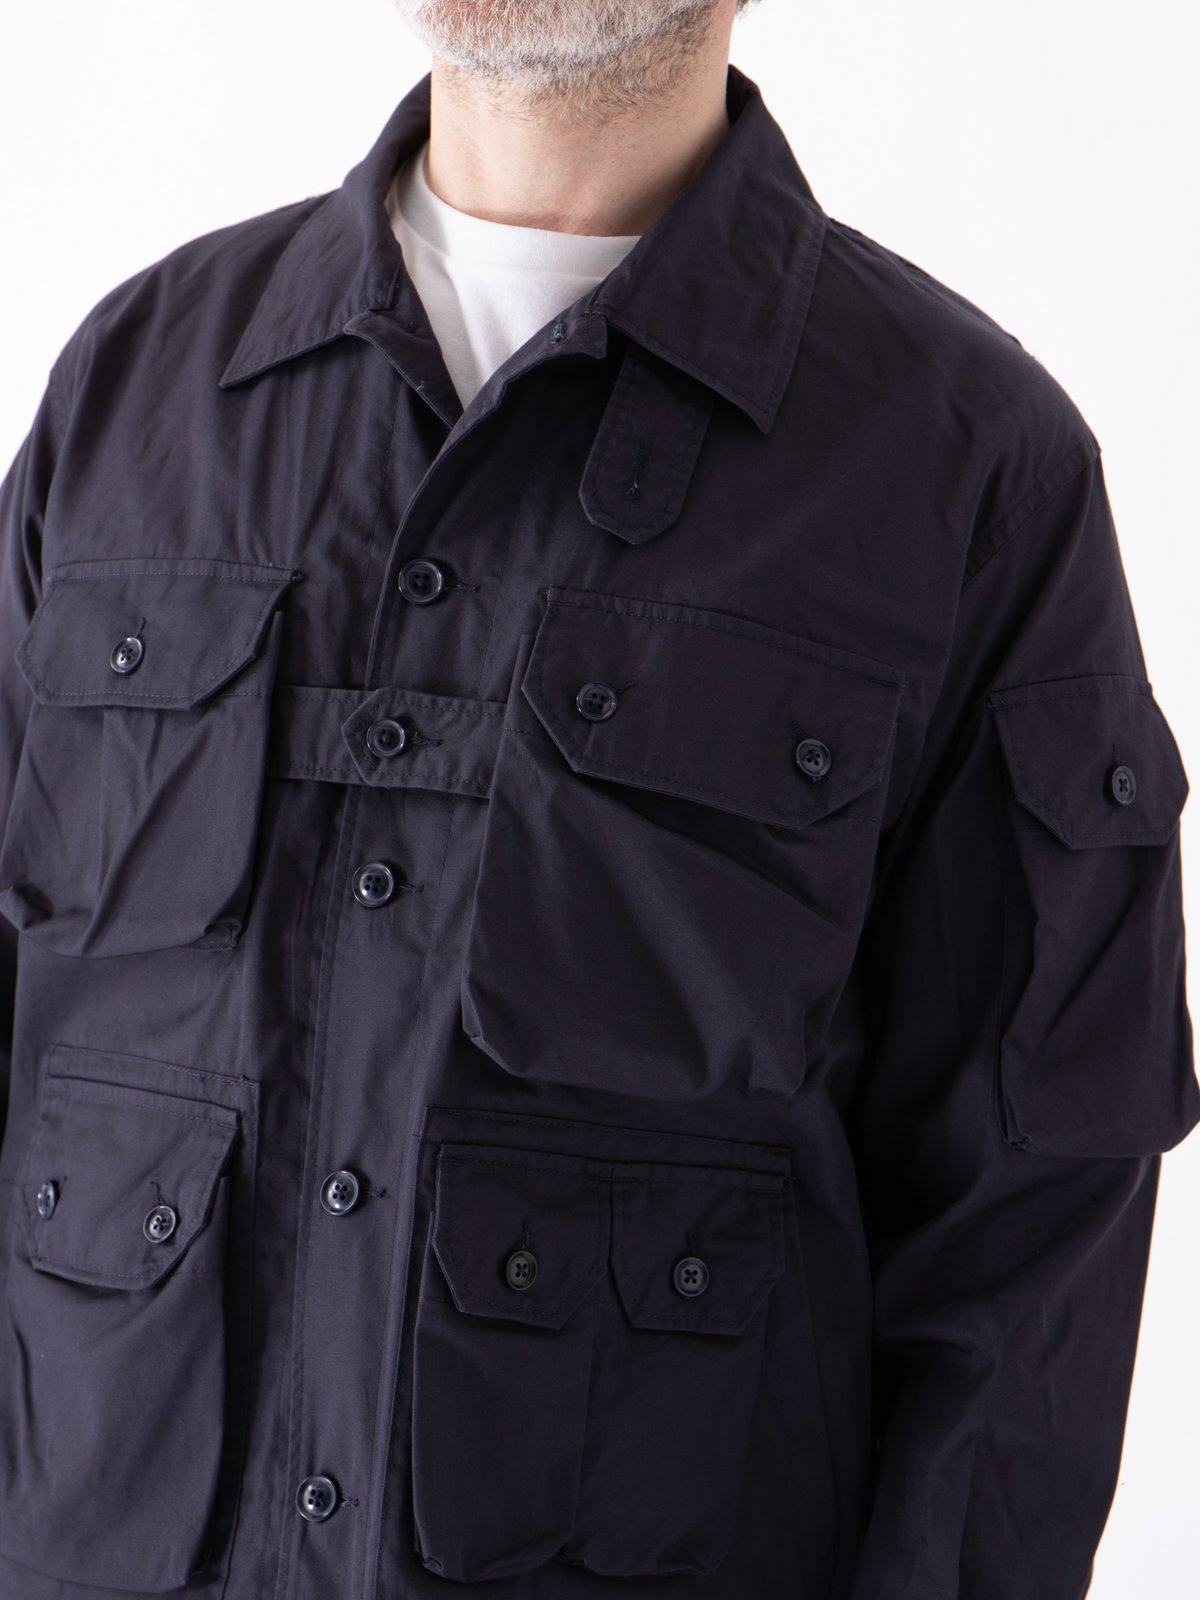 Dark Navy Highcount Twill Explorer Shirt Jacket - Image 3